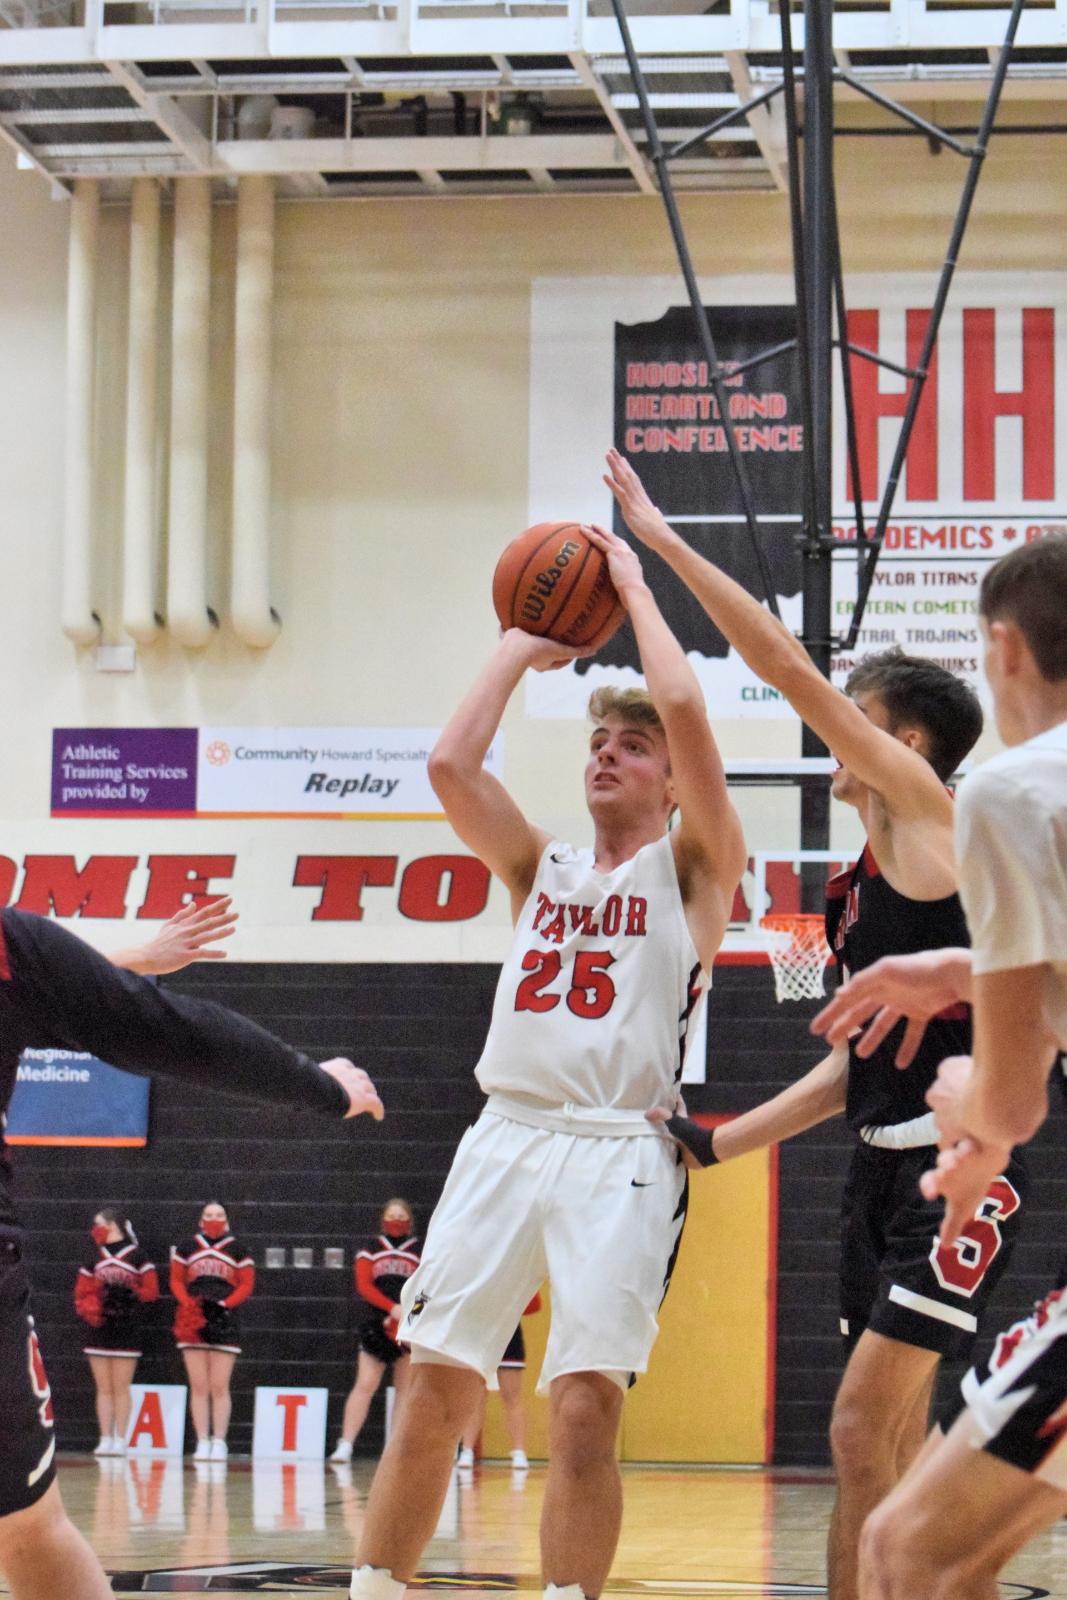 Taylor HS Boys Varsity Basketball vs Sheridan 1-29-21 (W 61-55)